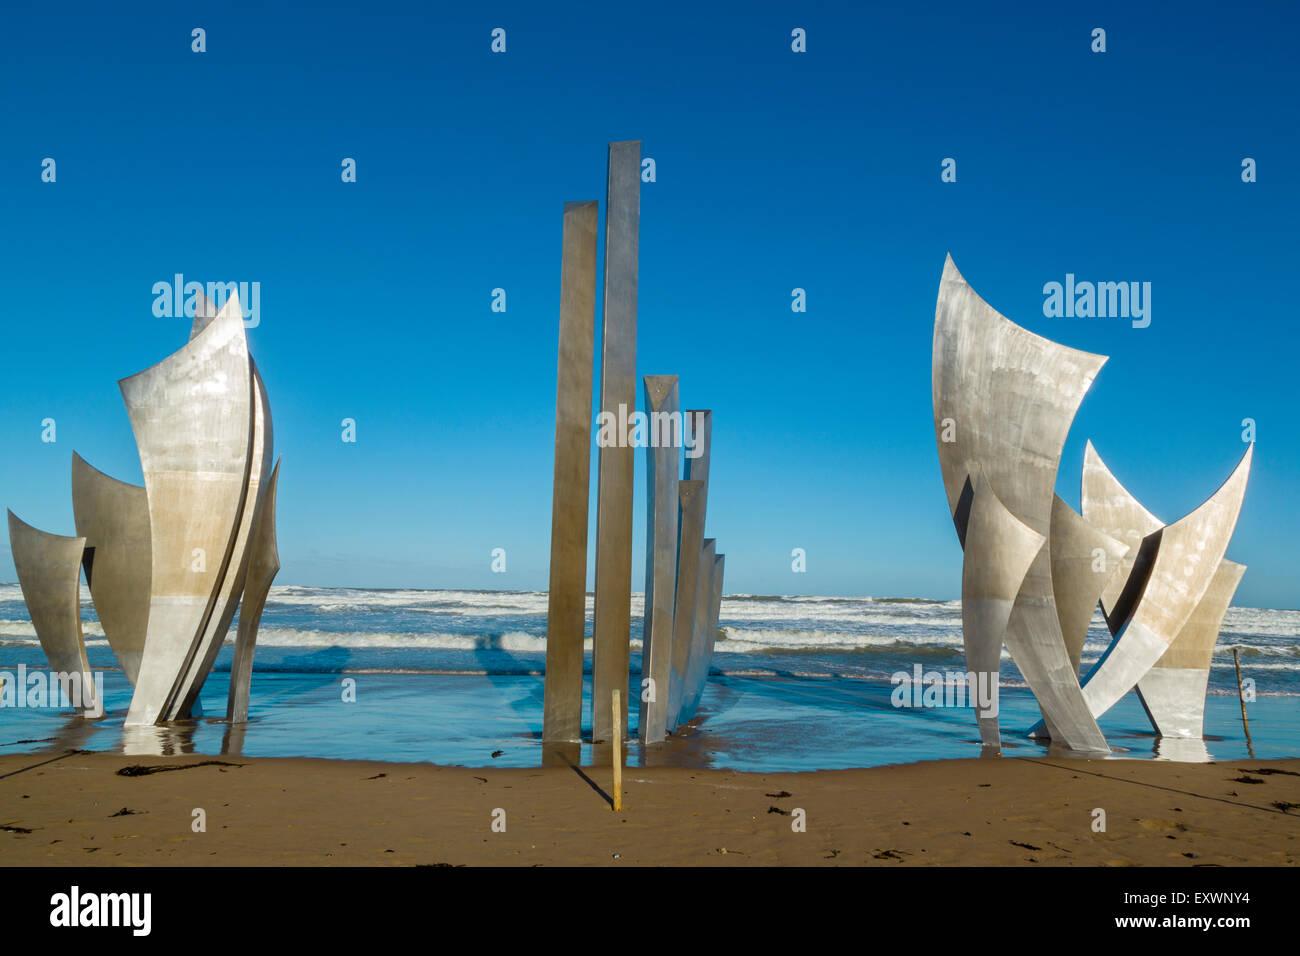 Omaha Beach, Memorial, Les Braves,Collevilles Sur Mer, Normandy, France - Stock Image